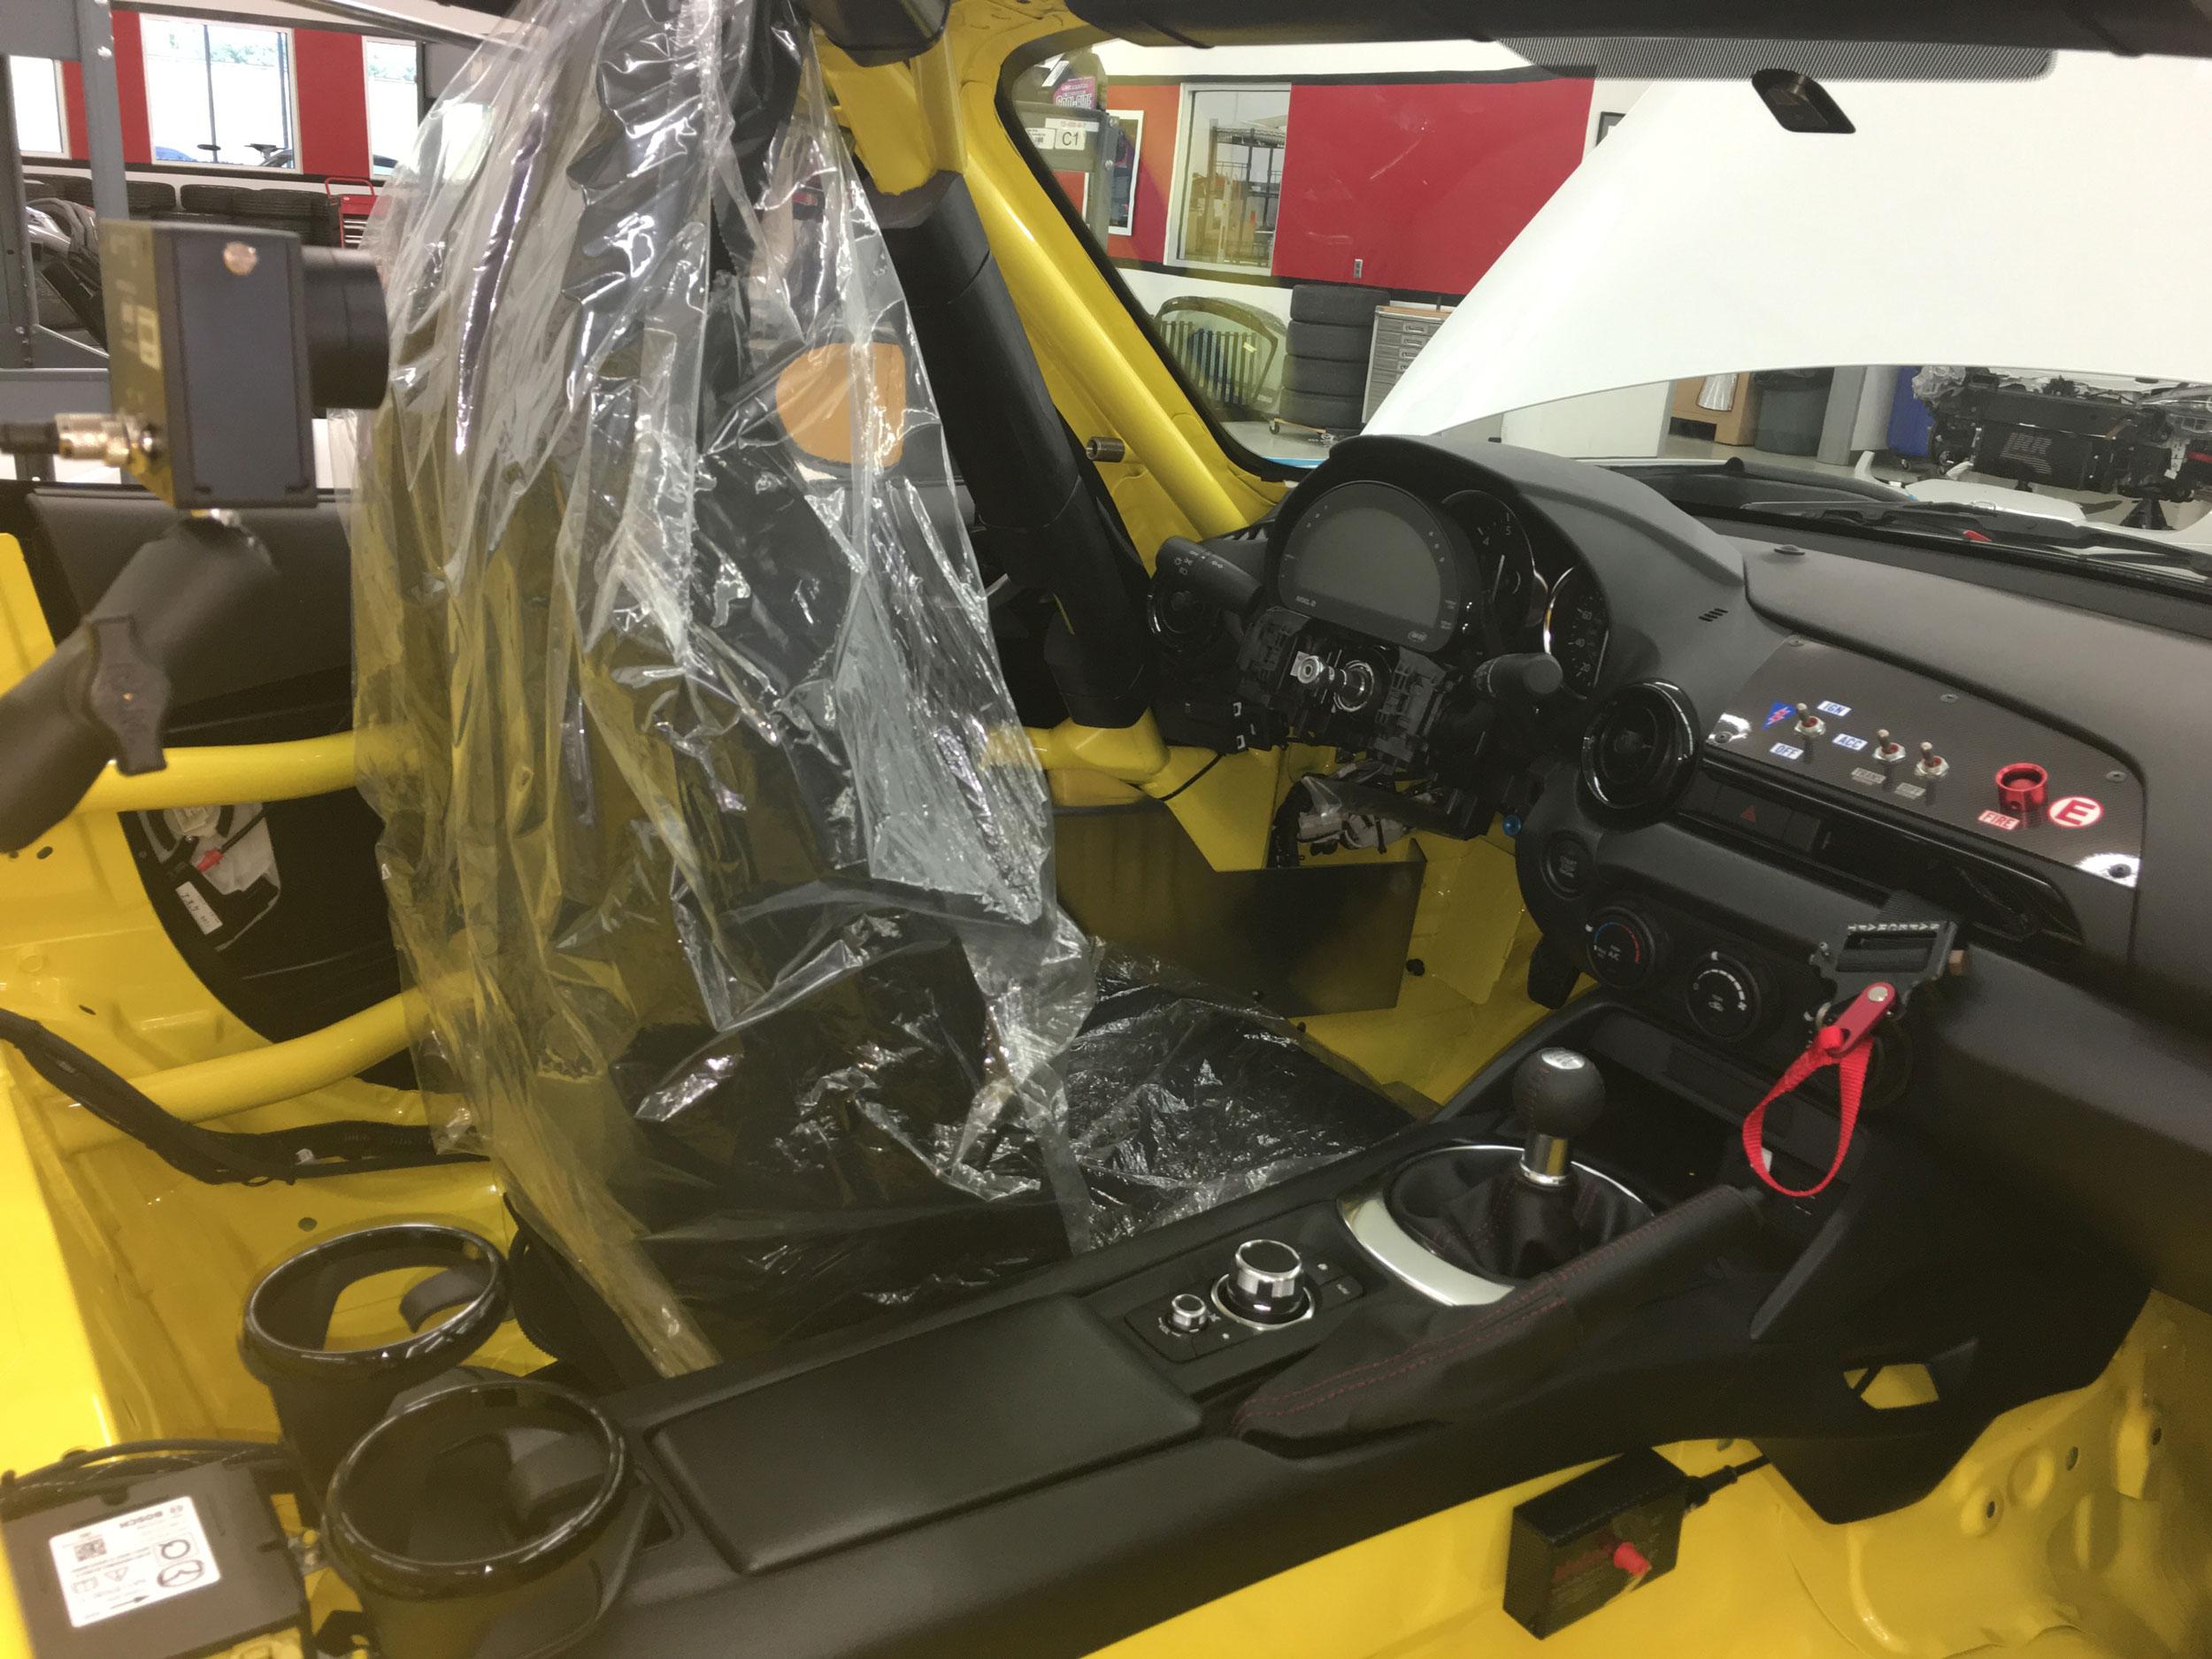 Mazda MX-5 Cup race car interior